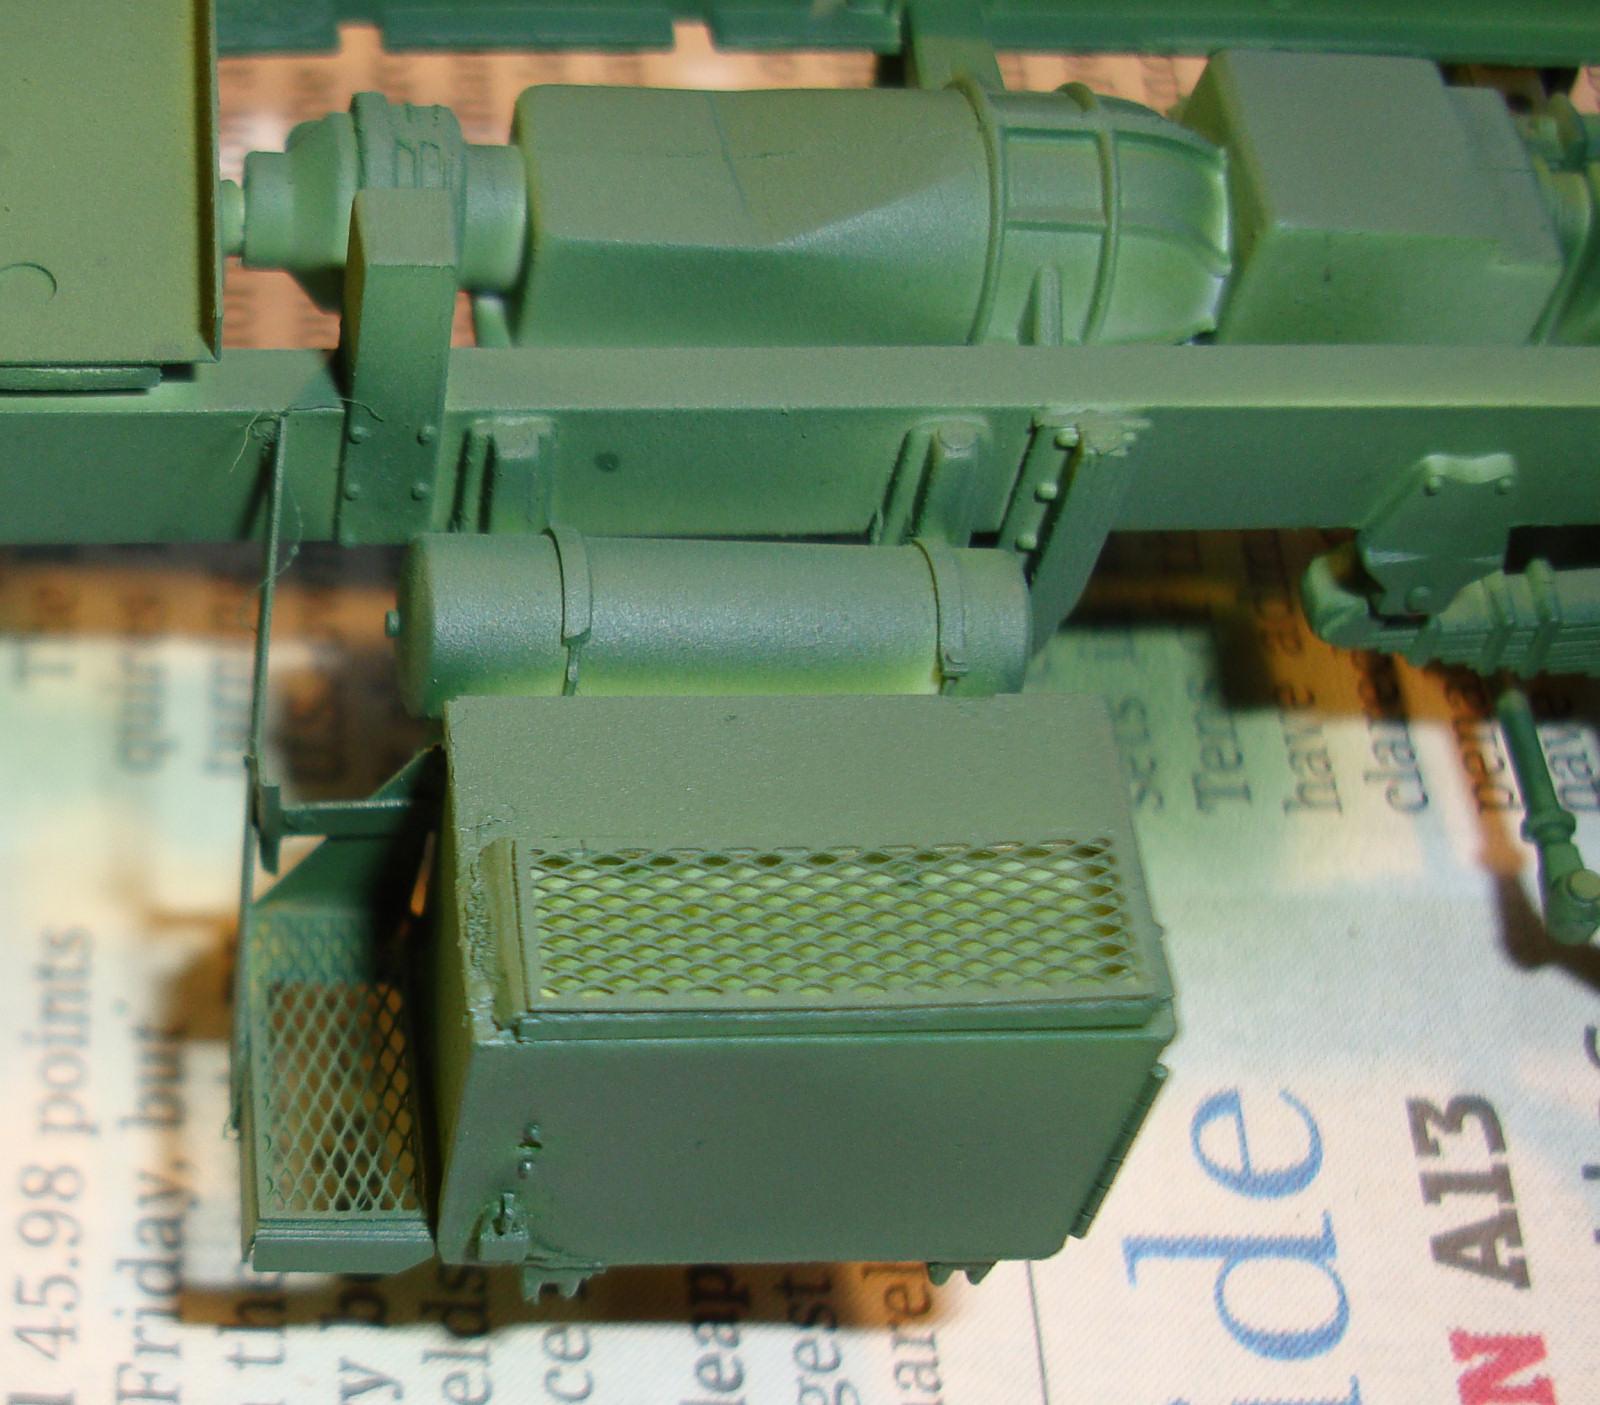 Build A Truck >> Italeri 6513 1/35 M923 'Hillbilly' Gun Truck Build Image 13